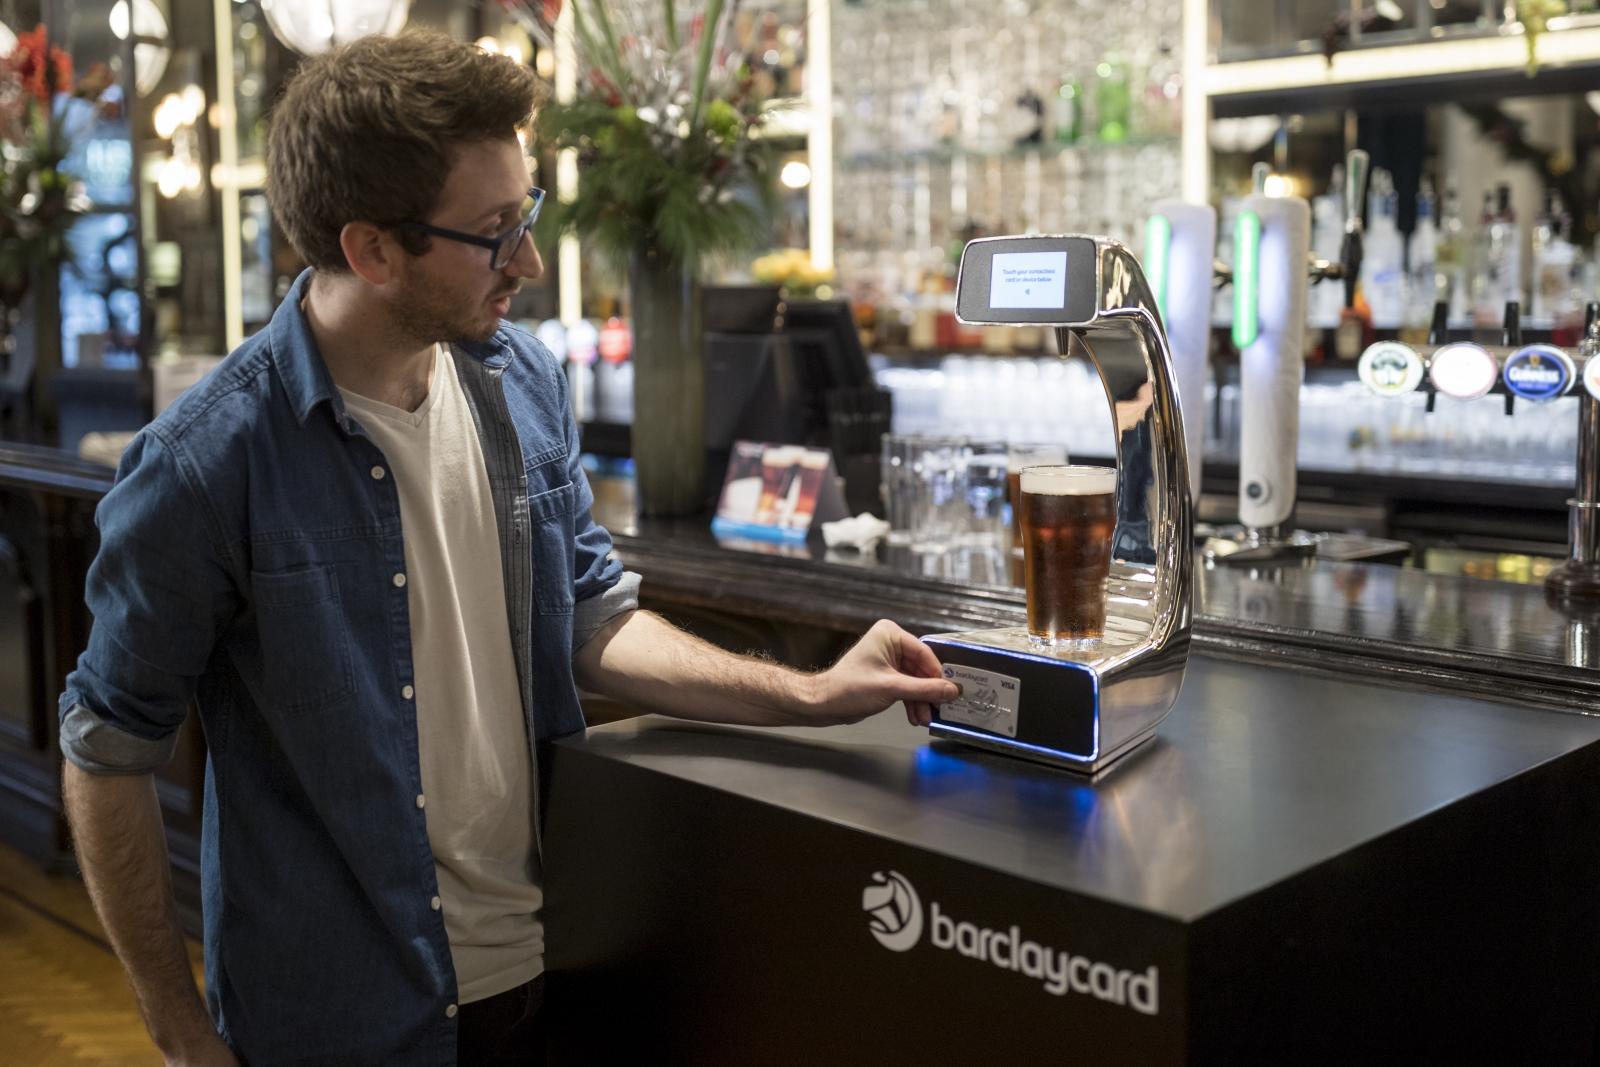 Barclaycard Pay @ Pump